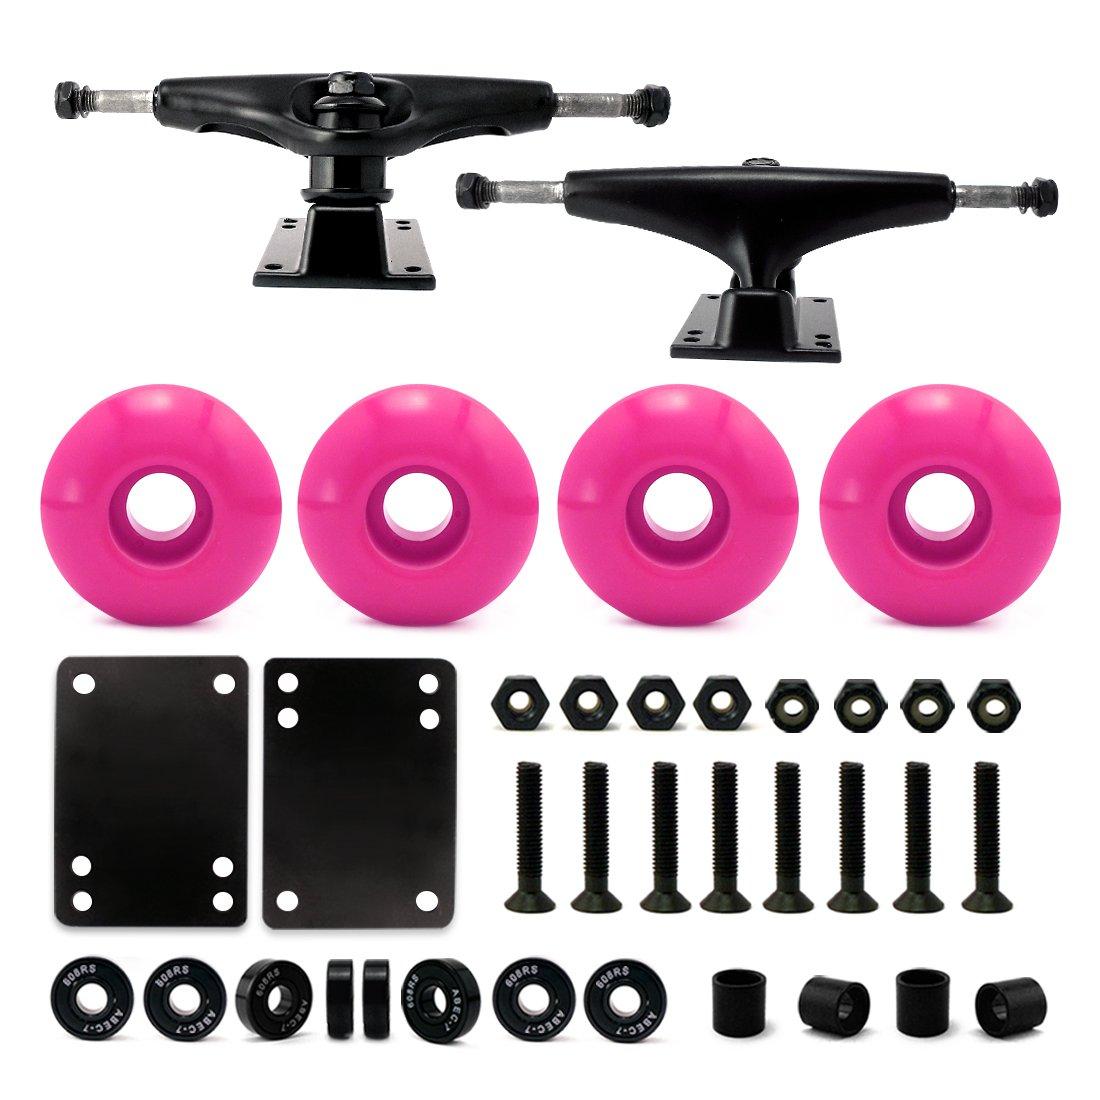 VJ 5.0 Skateboard Trucks (Black), Skateboard Wheels 52mm, Skateboard Bearings, Skateboard Pads, Skateboard Hardware 1'' (52mm Pink) by VJ